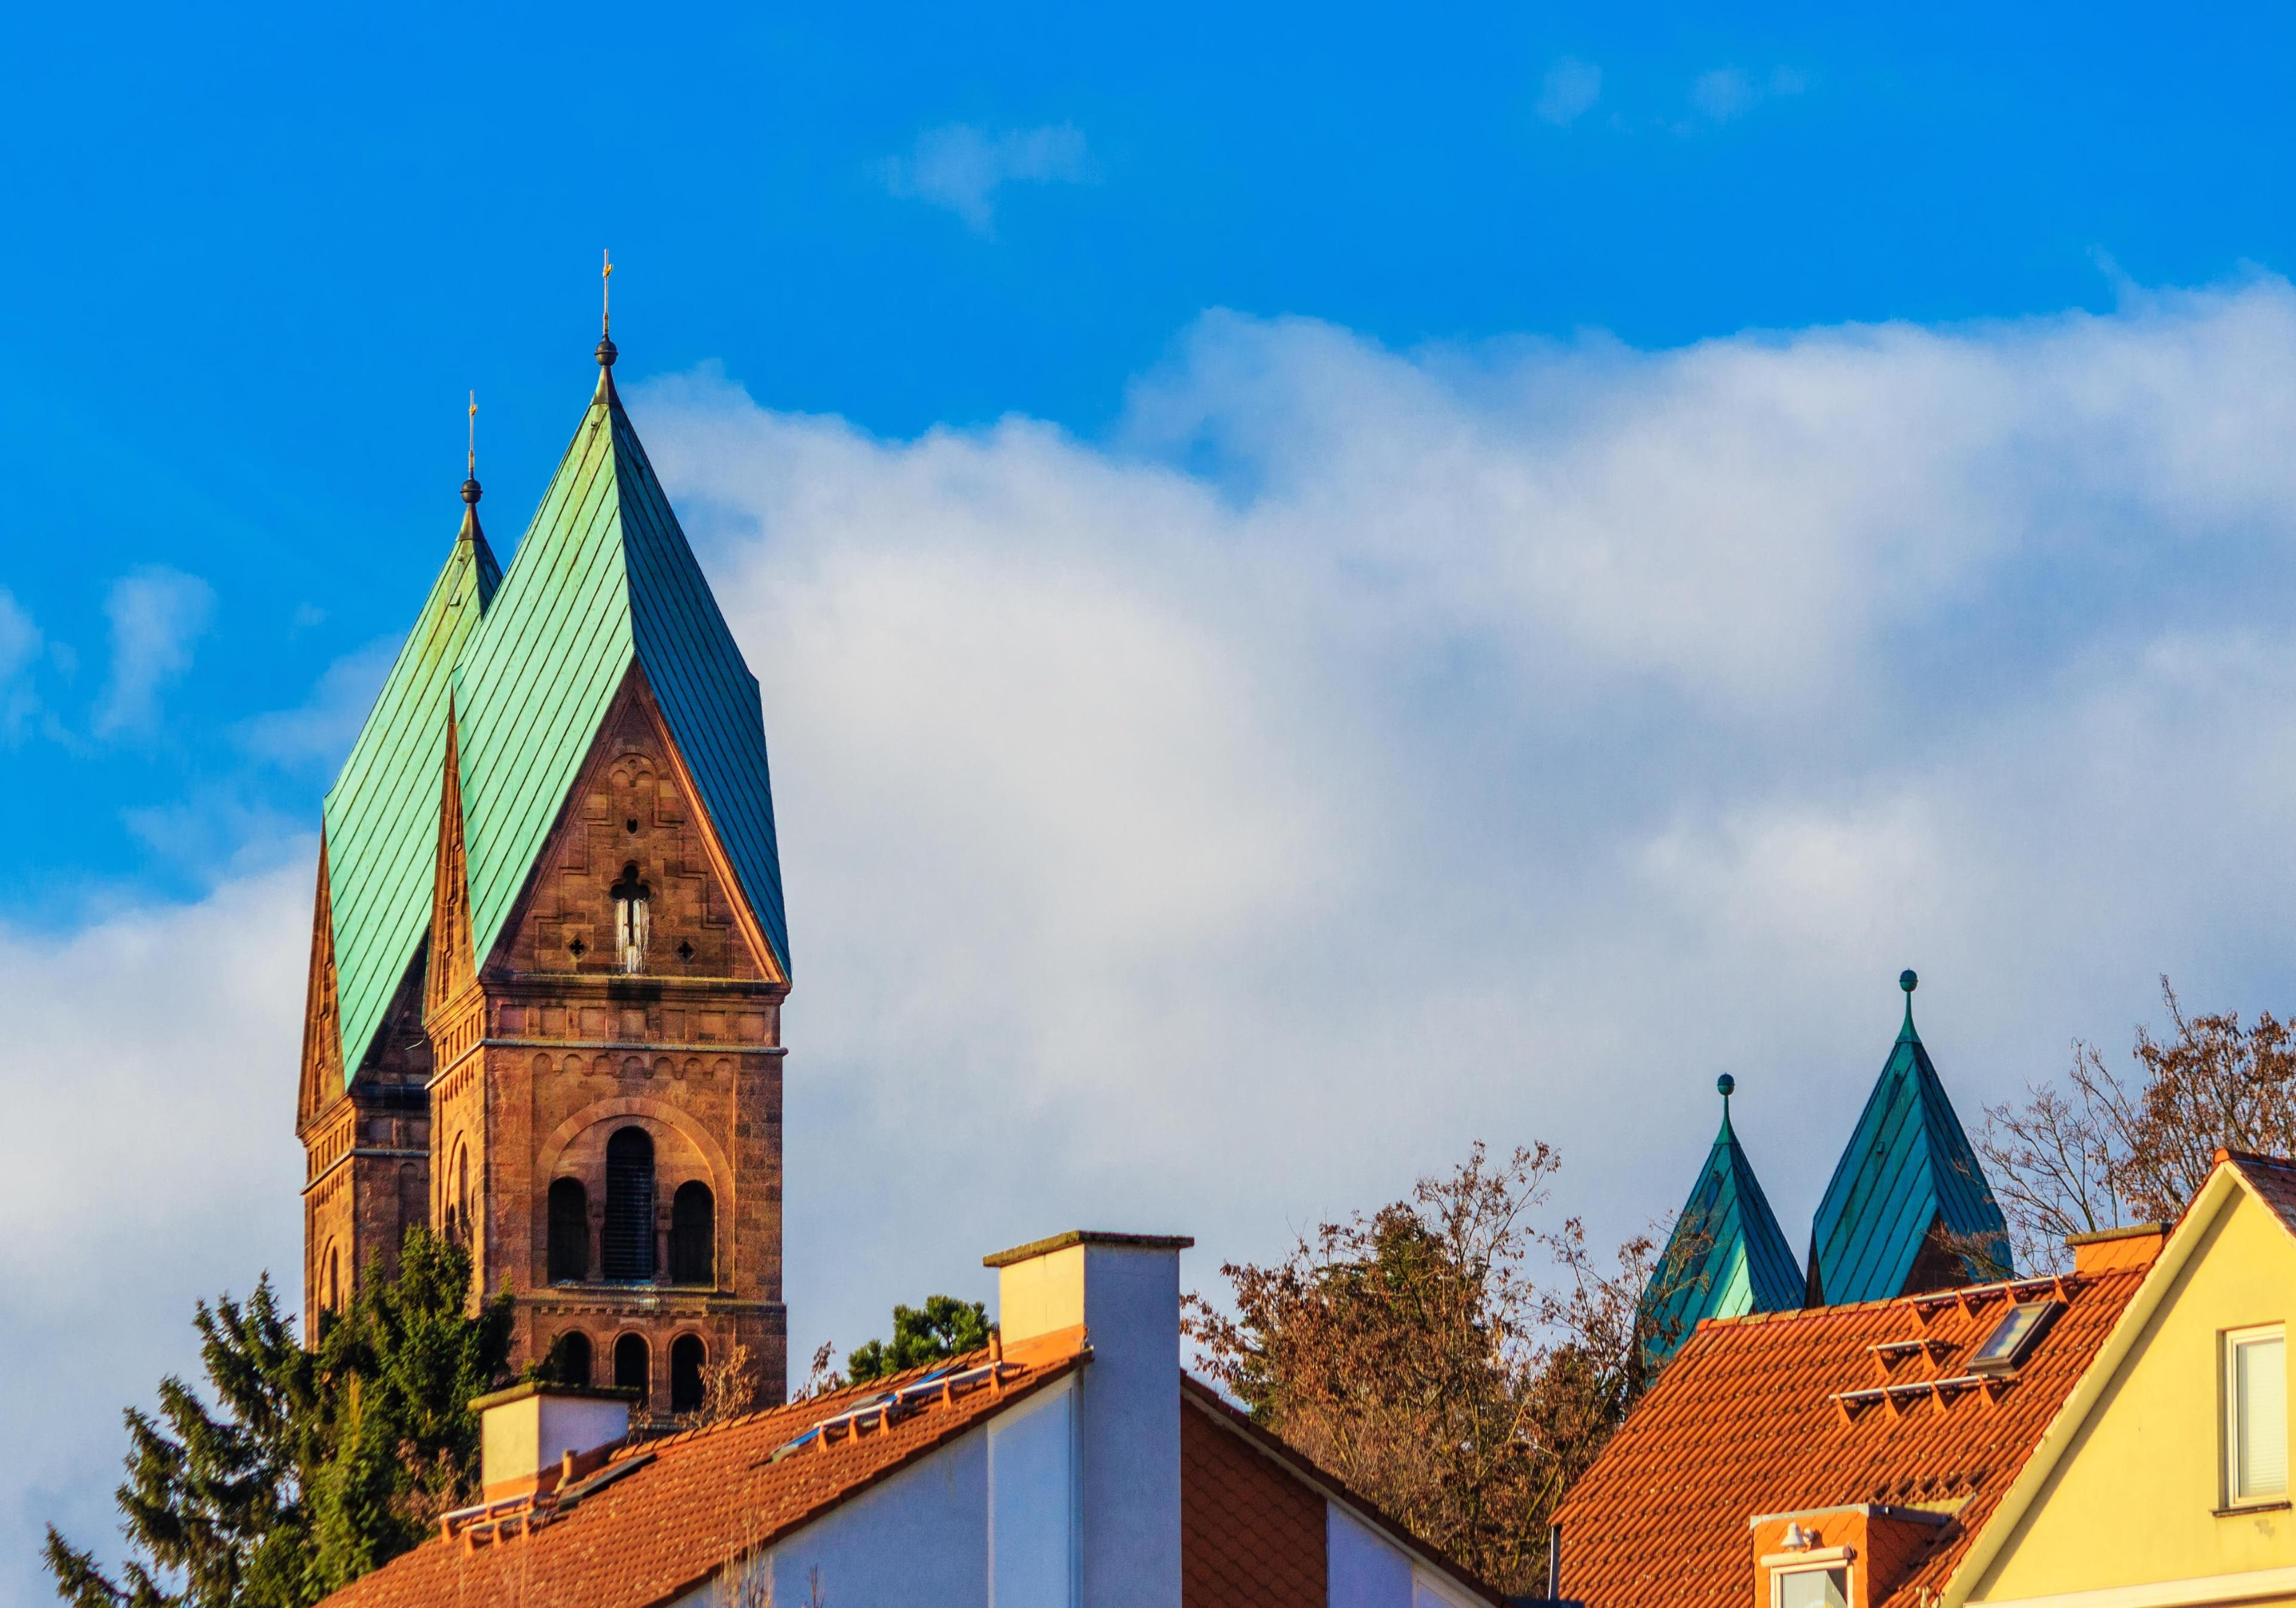 Bad Homburg, Hessen